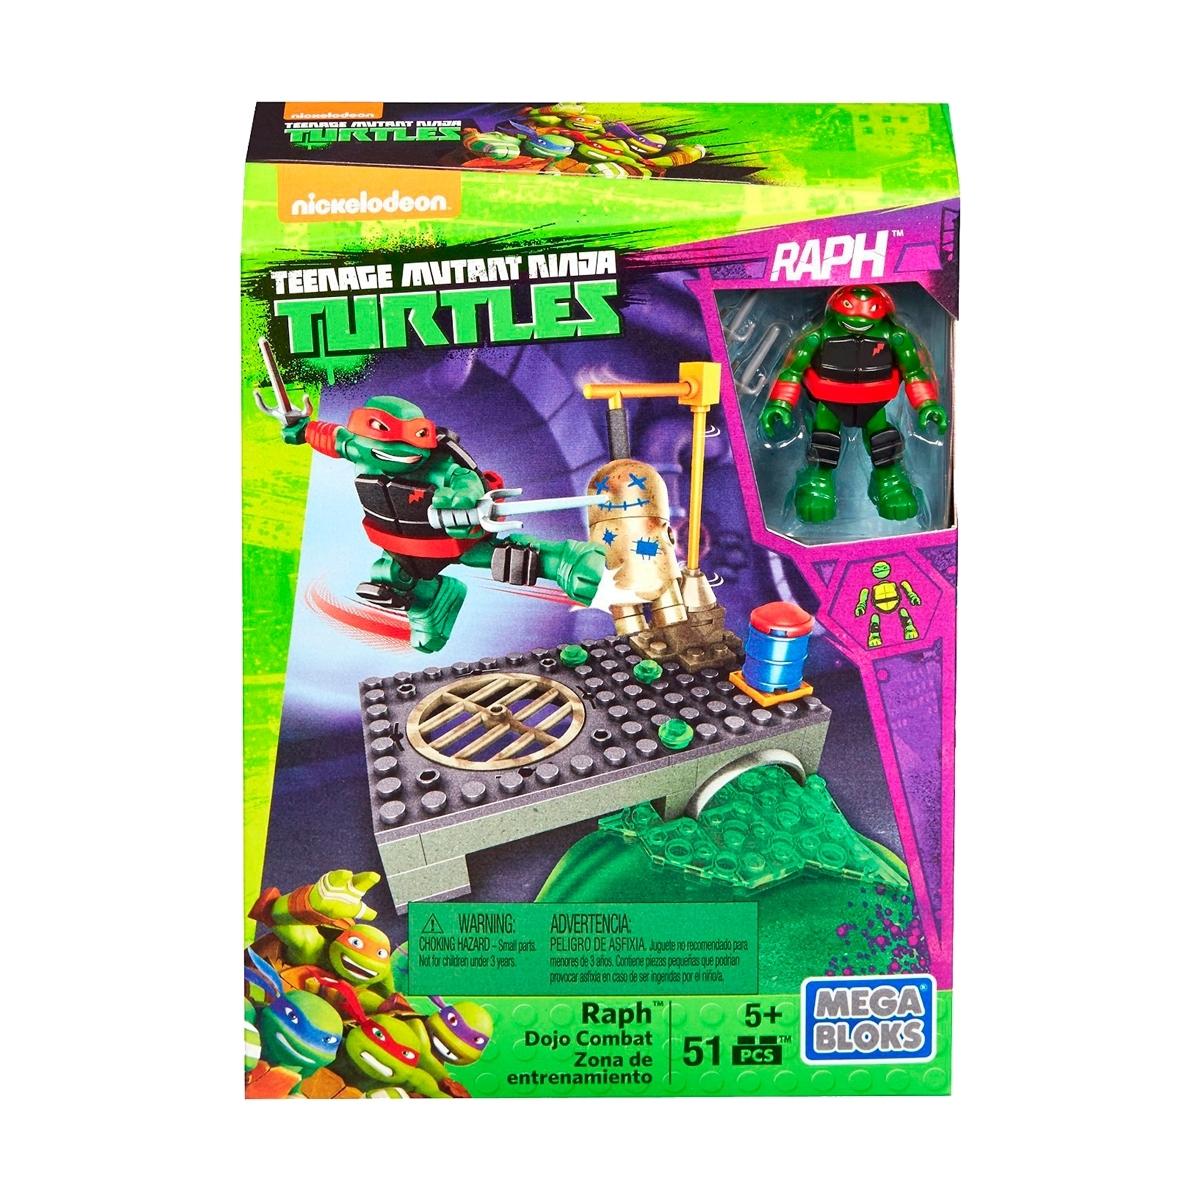 ������� ����� Mega Bloks ��������� ������ ����� ������������� ������